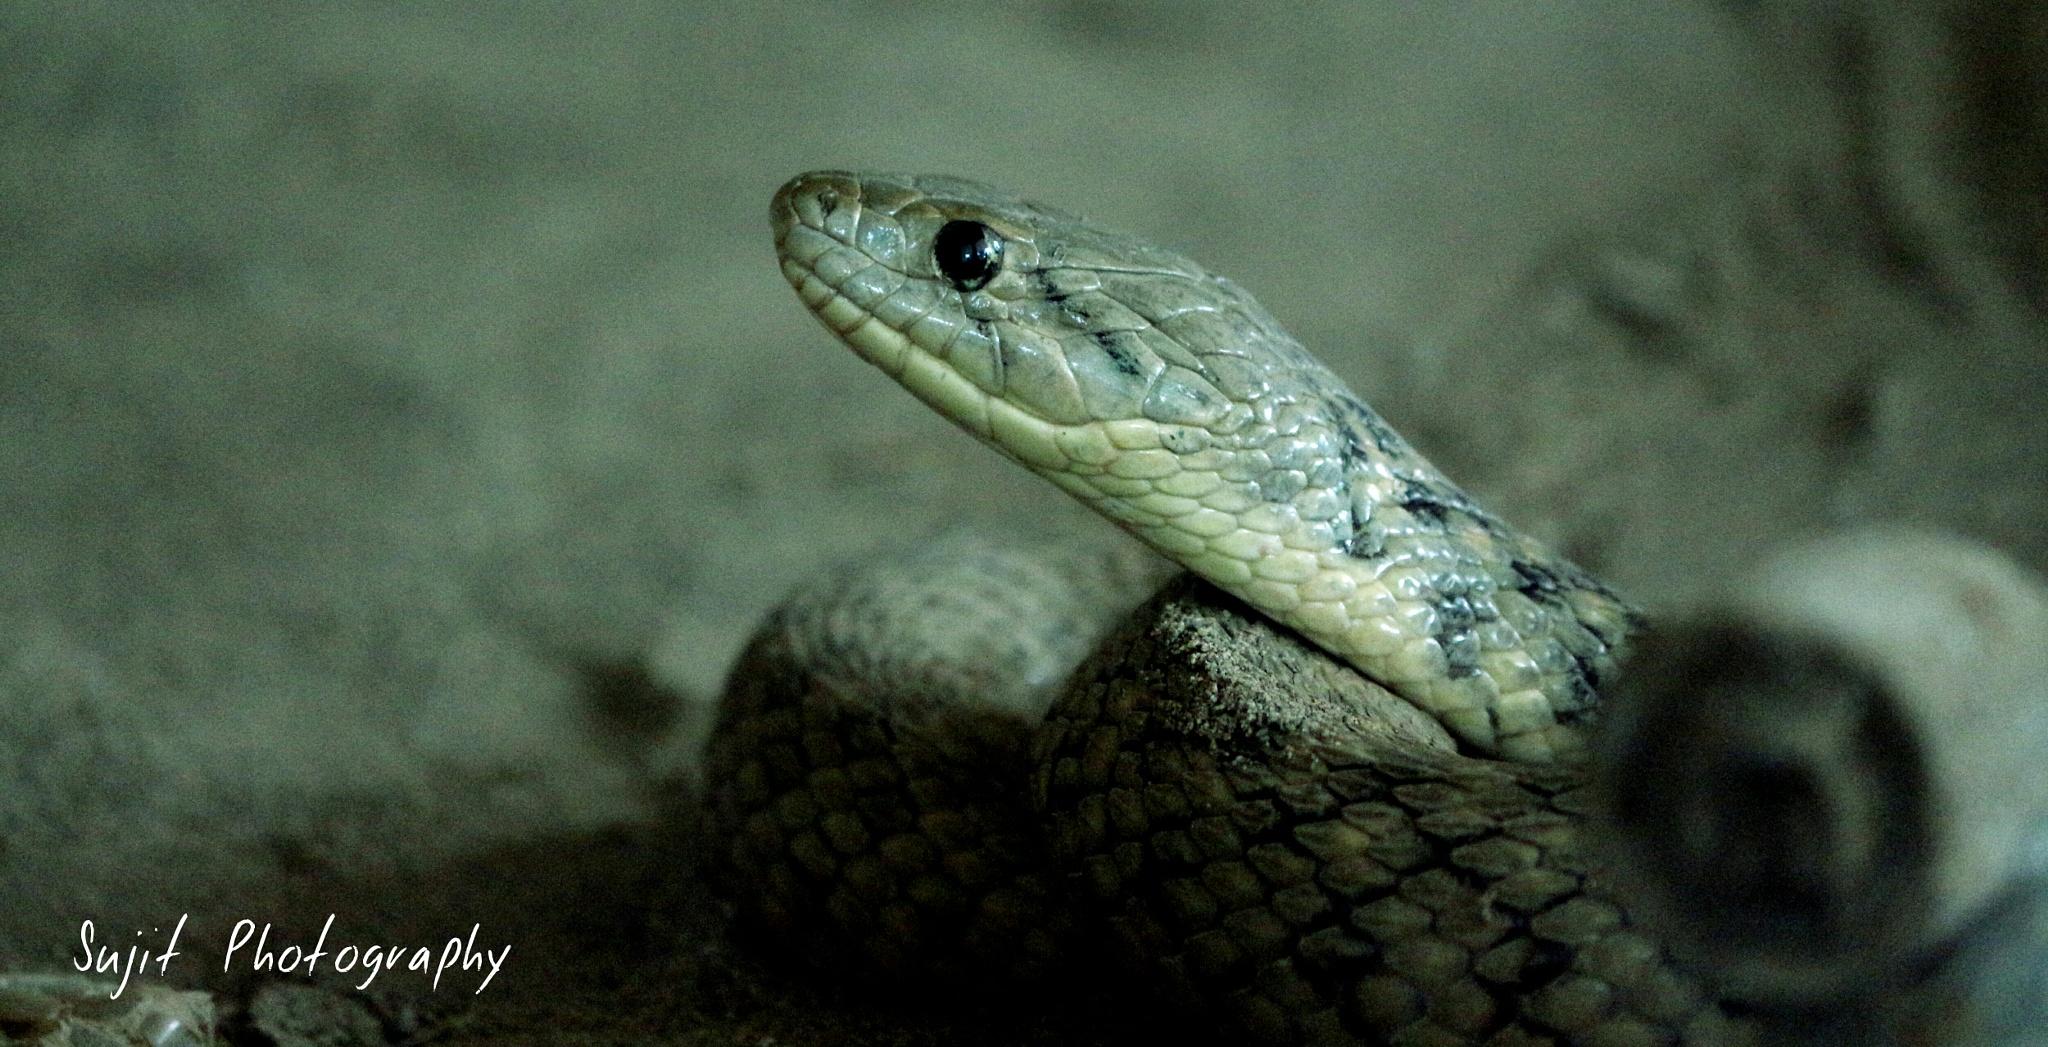 Rat Snake by  Sujit Photography